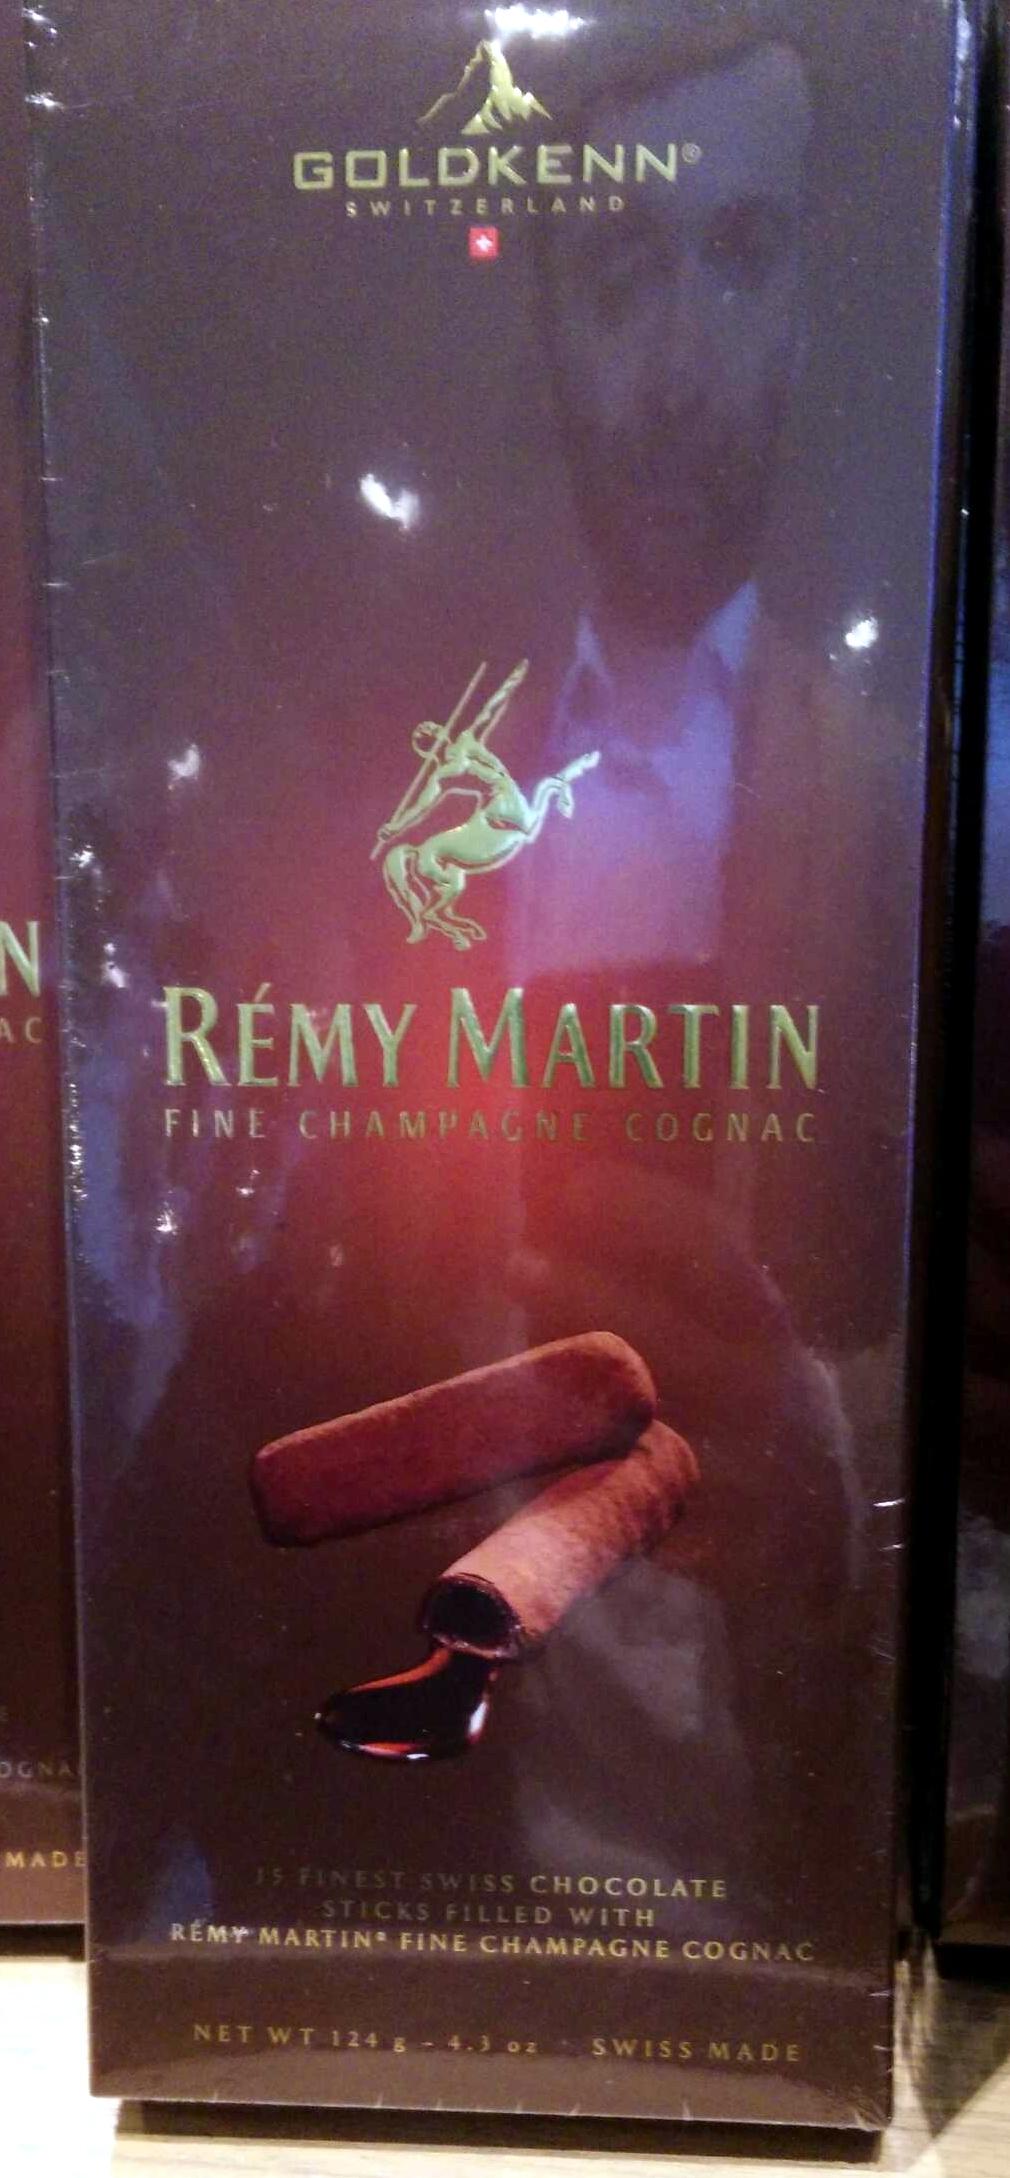 Golkenn Rémy Martin Fine Champagne Cognac - Product